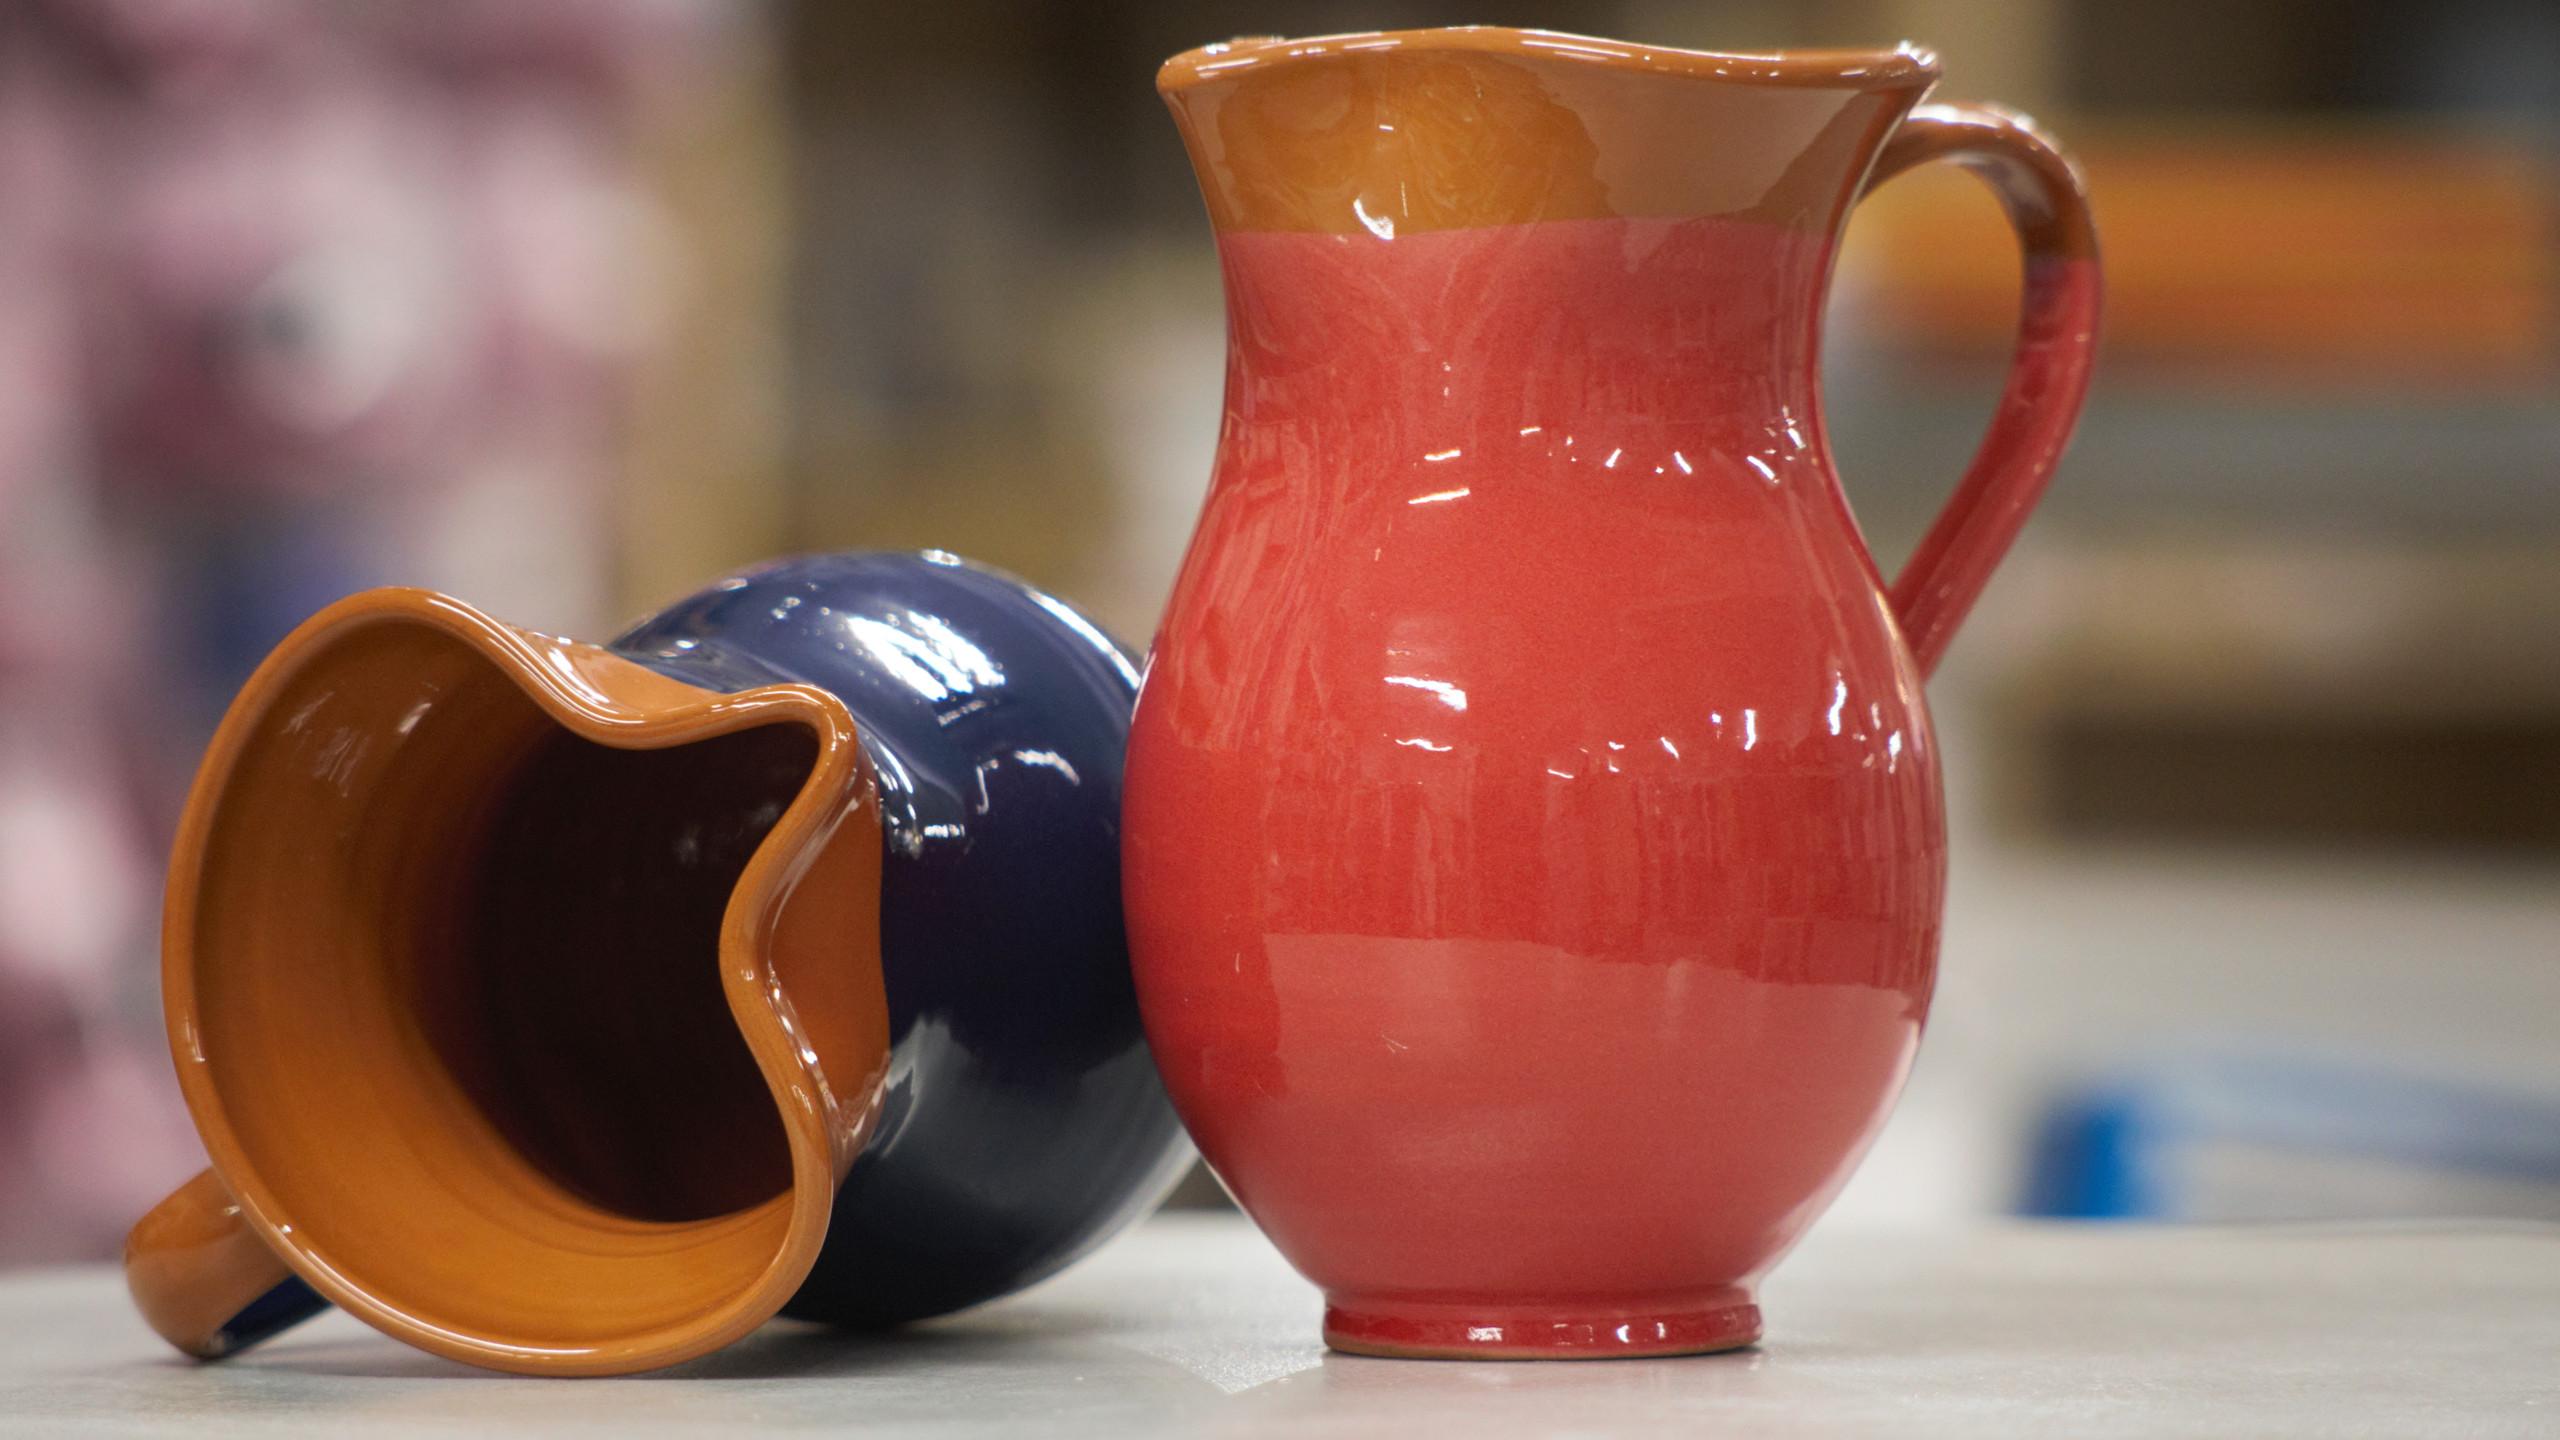 rustic pottery jugs